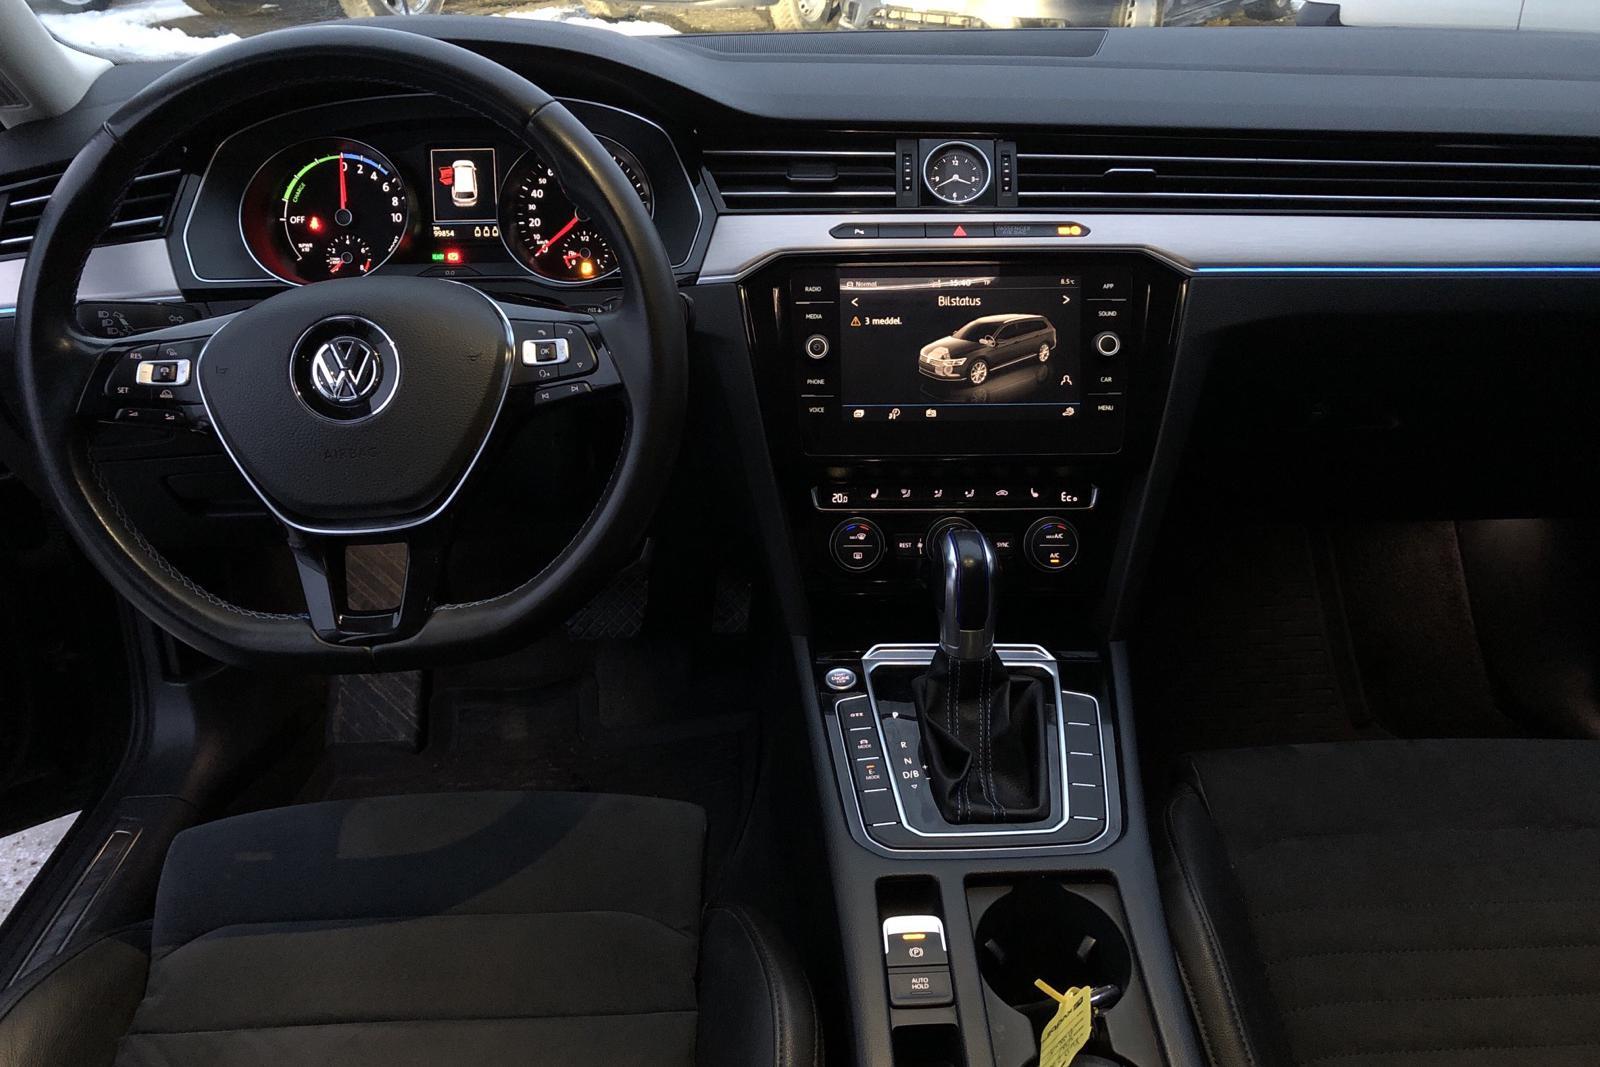 VW Passat 1.4 Plug-in-Hybrid Sportscombi (218hk) - 99 850 km - Automatic - Dark Grey - 2018